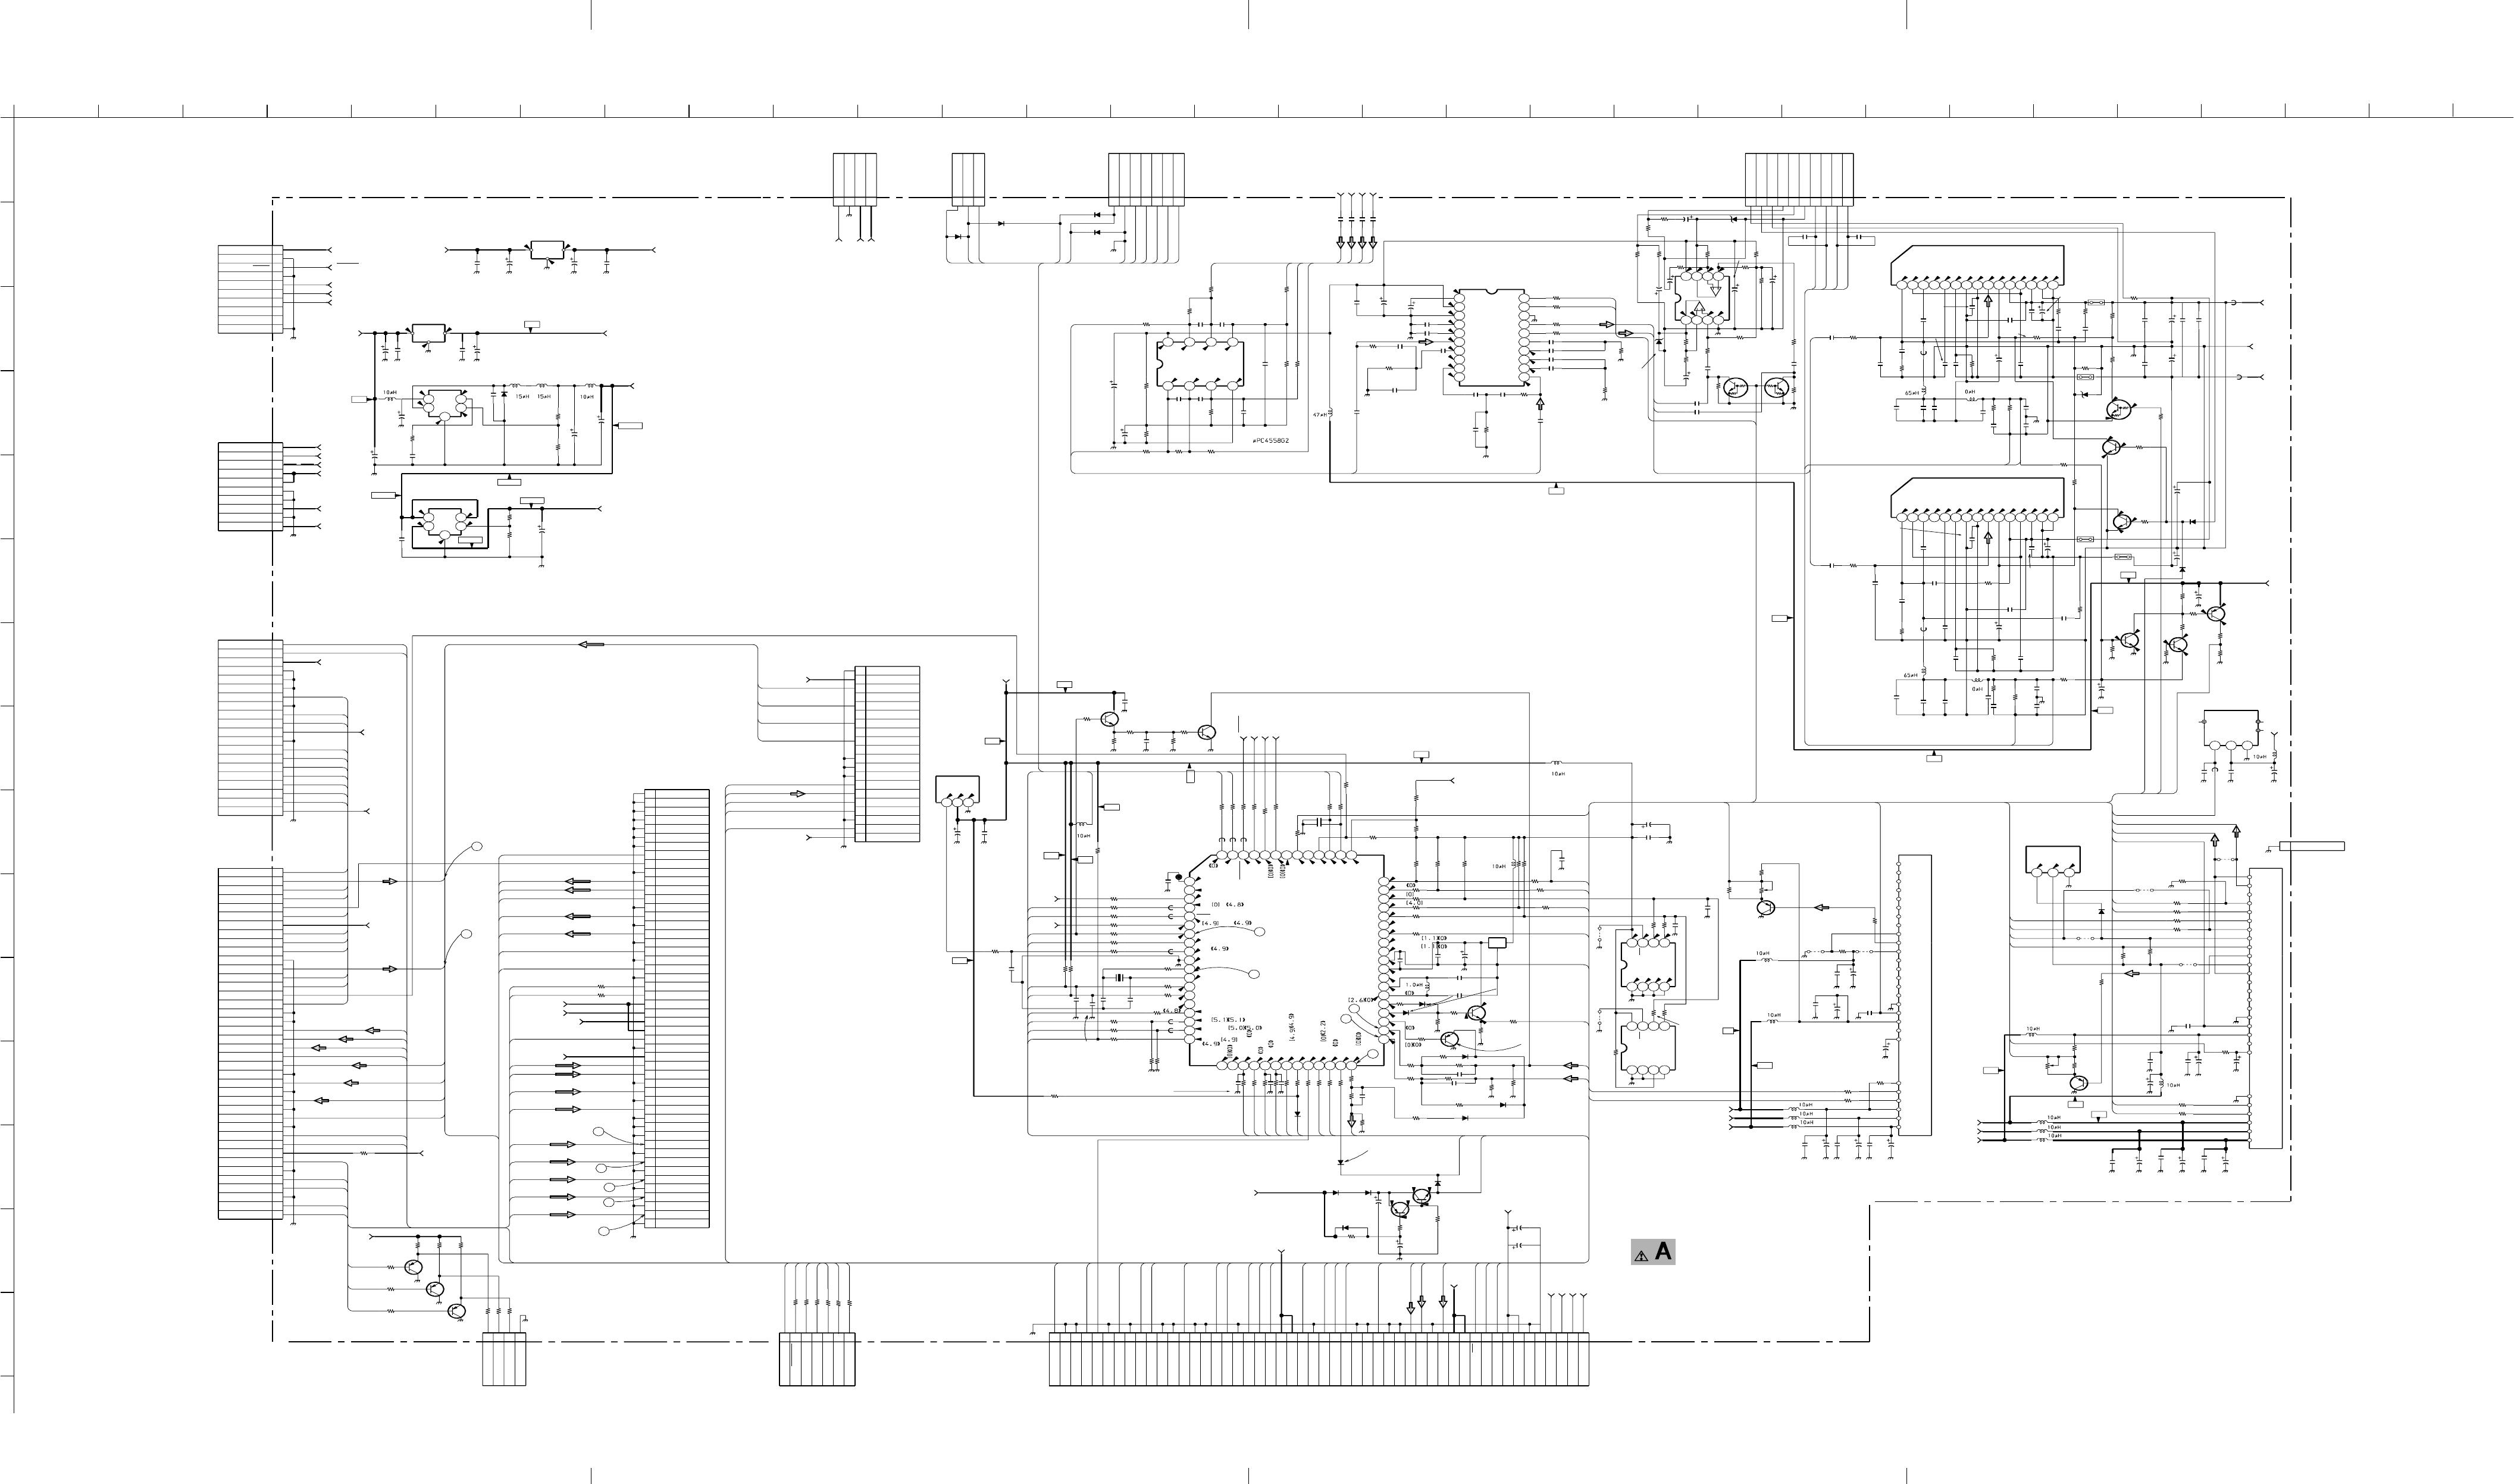 Sony Trinitron Kv Es29m90 Users Manual Technology Malaysia Sdn Bhd Diagram Wire Sensor Cdp 2 Snow 90 91